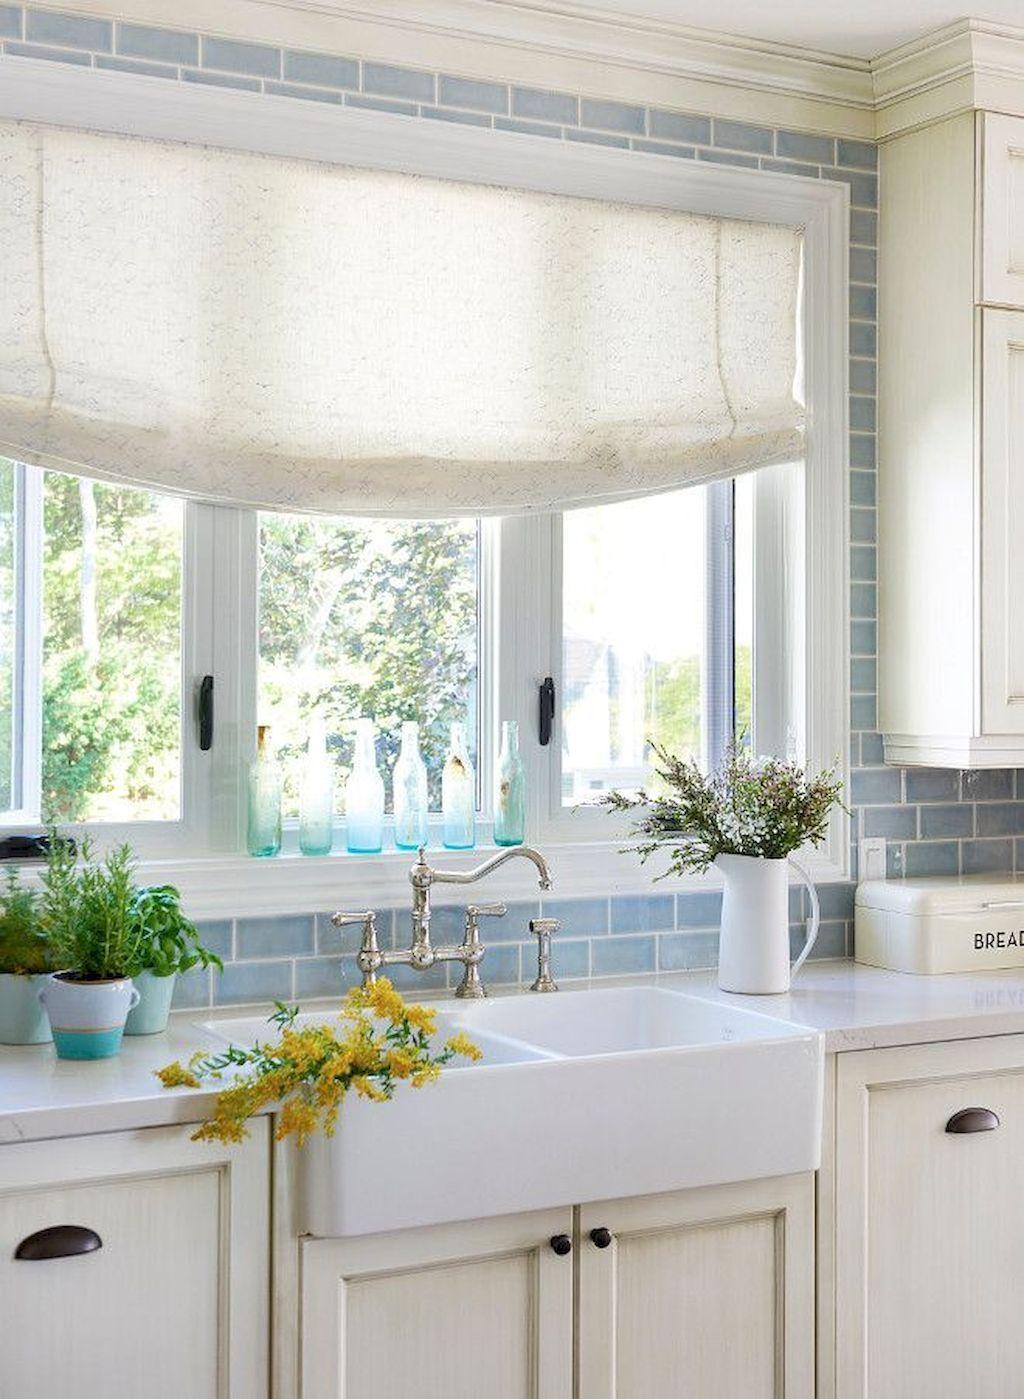 25 Best Farmhouse Tile Backsplash Ideas Blue Backsplash Kitchen Coastal Kitchen Design Farmhouse Sink Kitchen